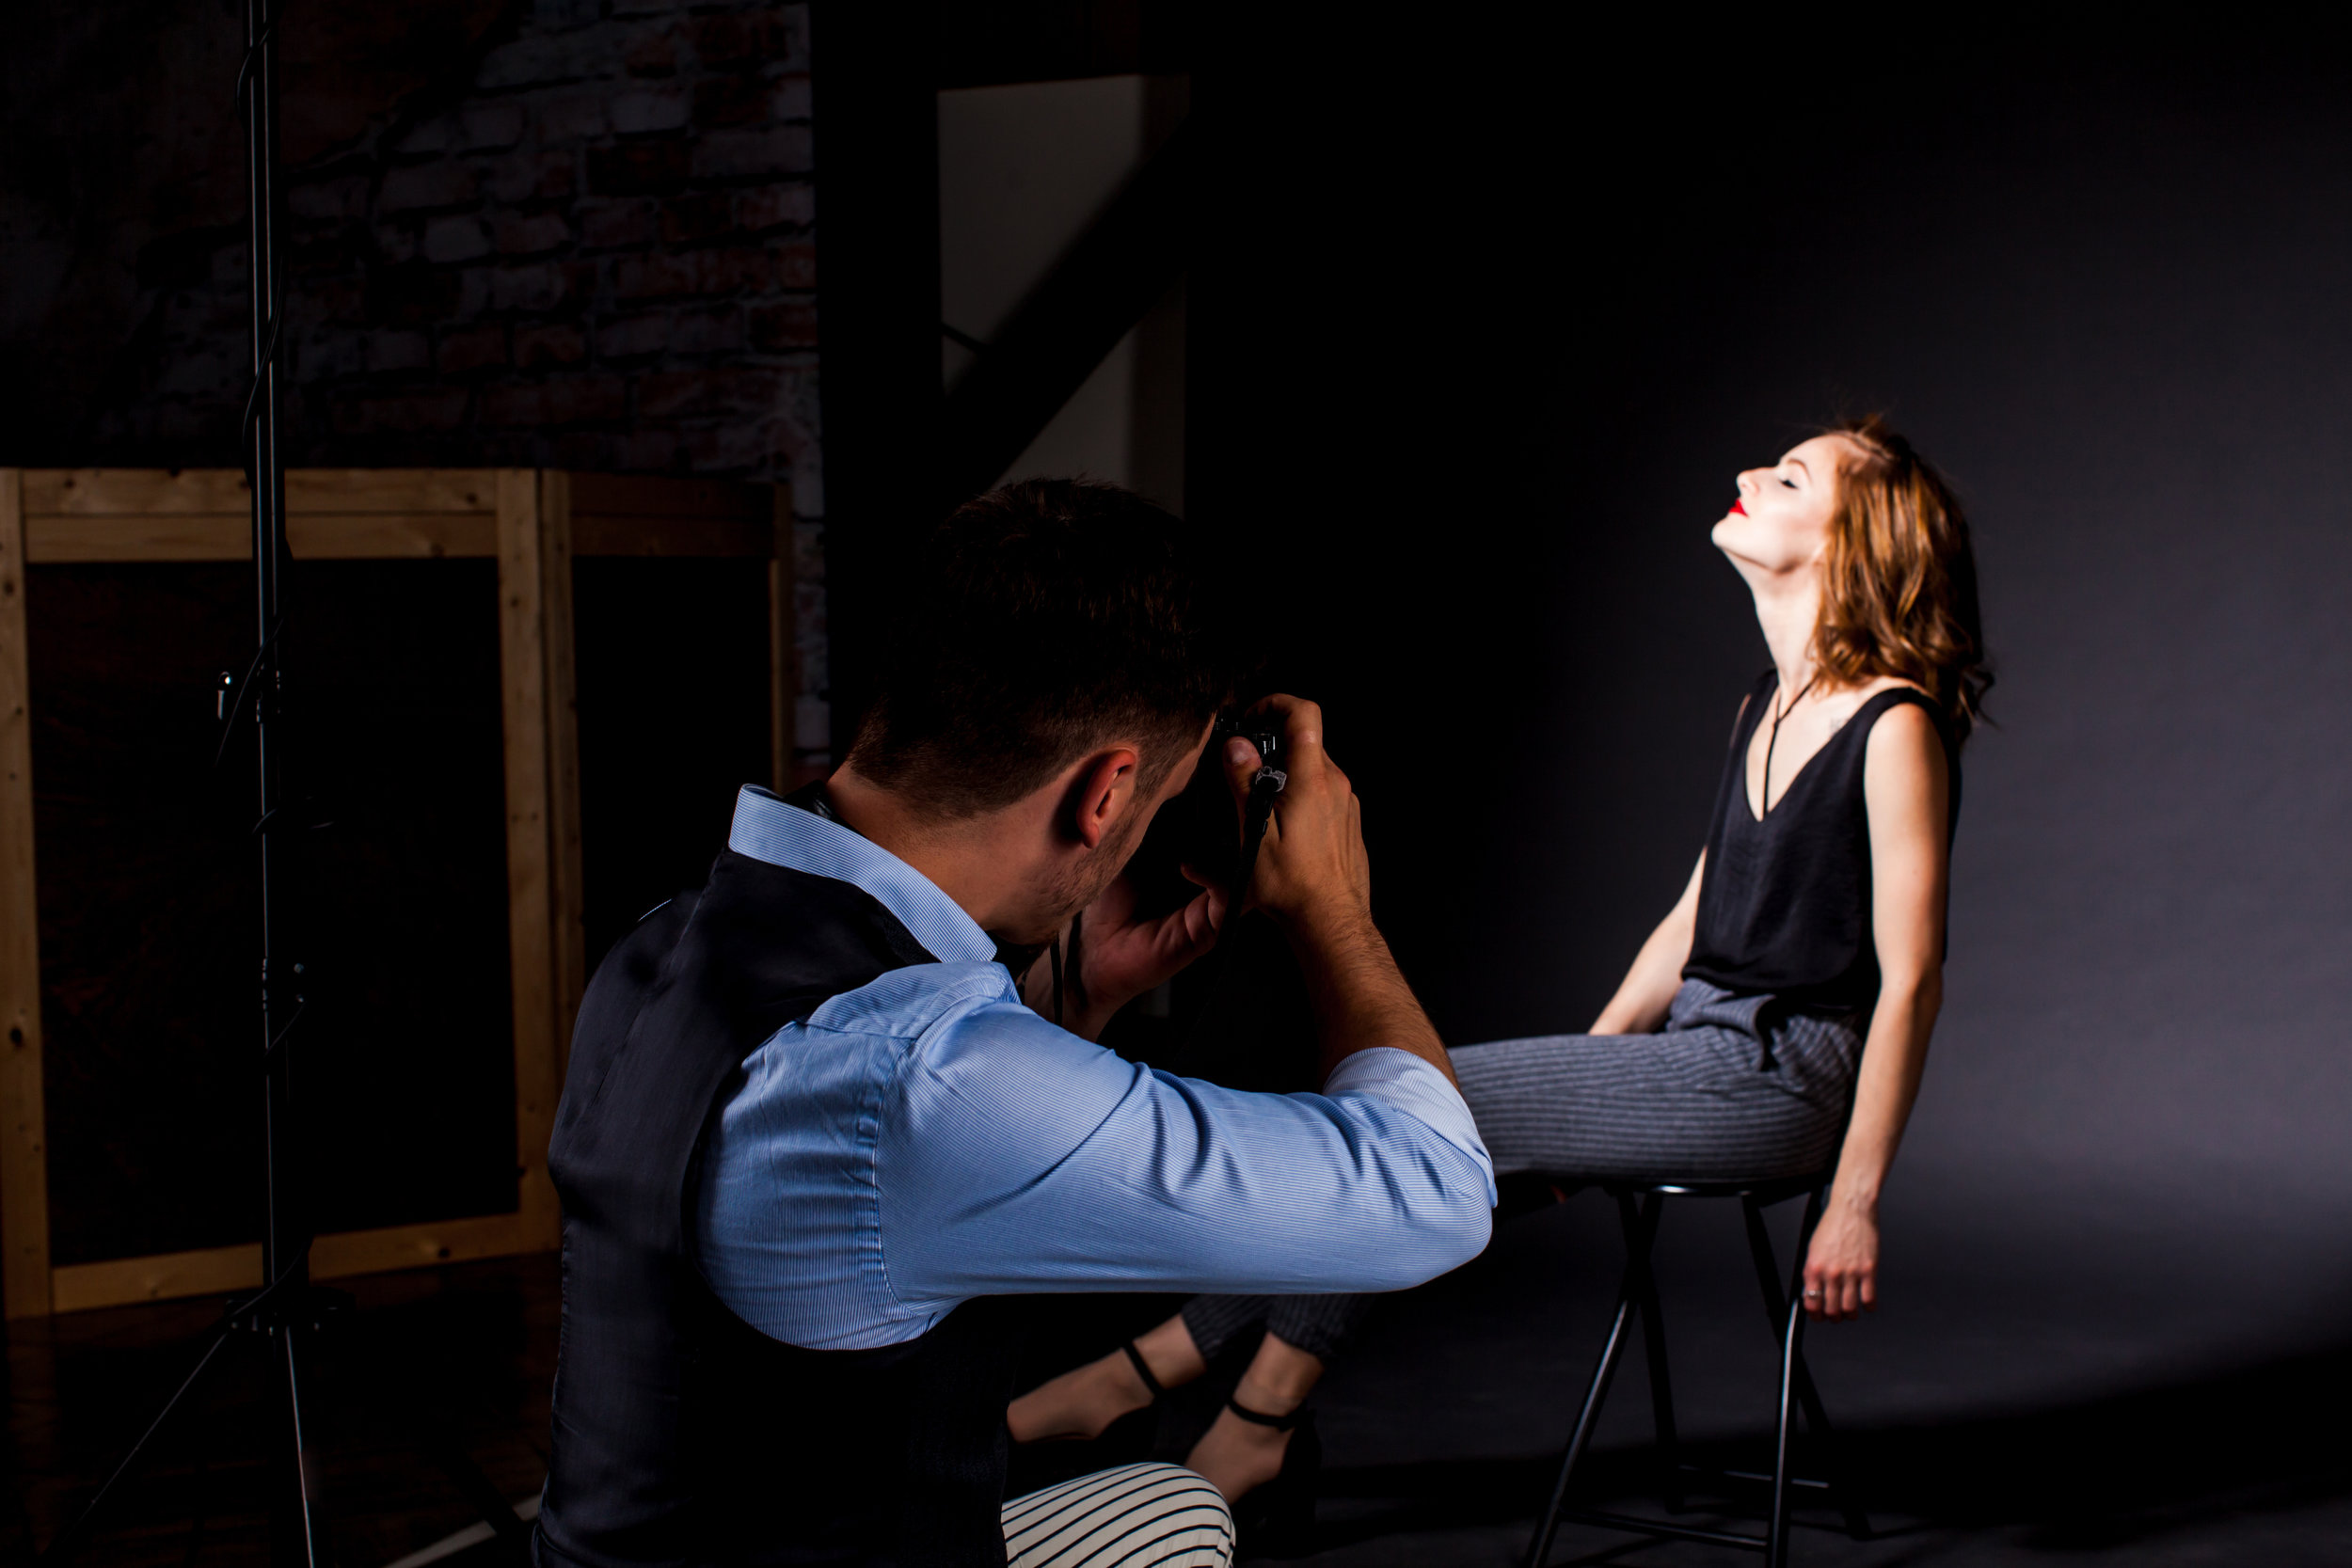 Studio photosession process